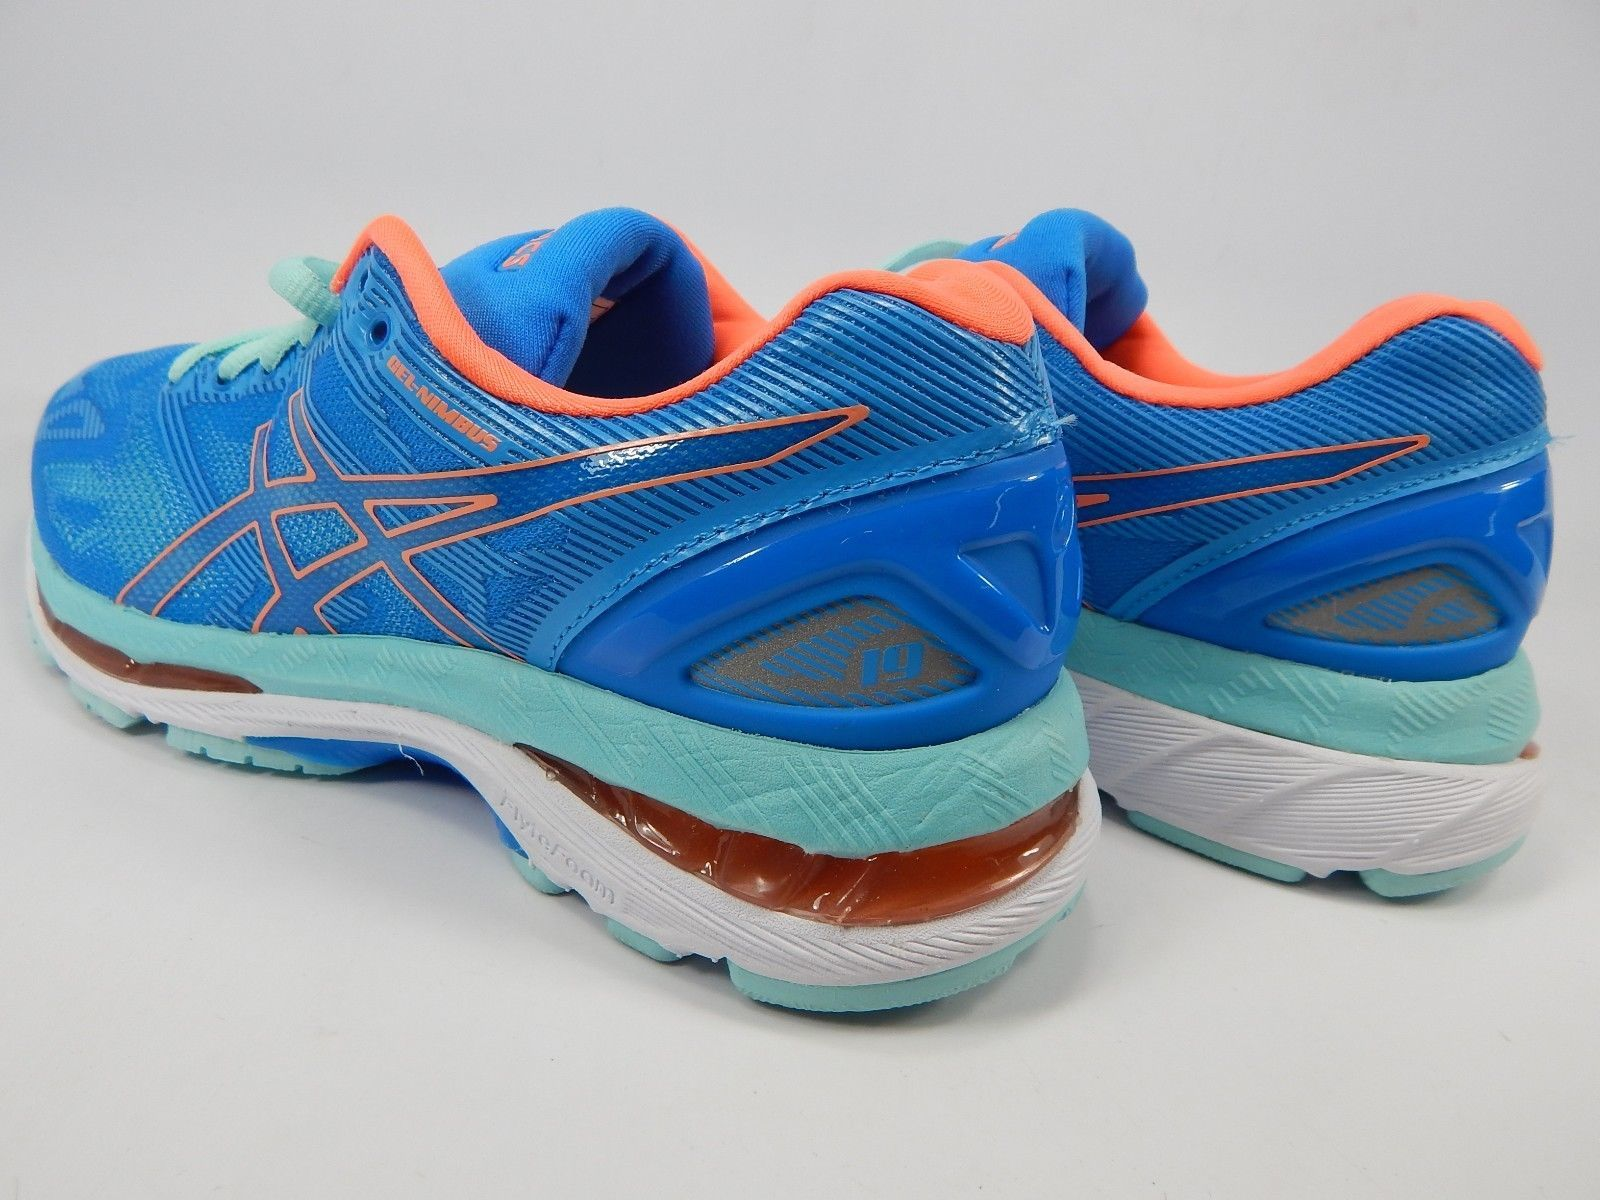 Asics Gel Nimbus 19 Size US 6 M (B) EU 37 Women's Running Shoes Aqua Blue T750N